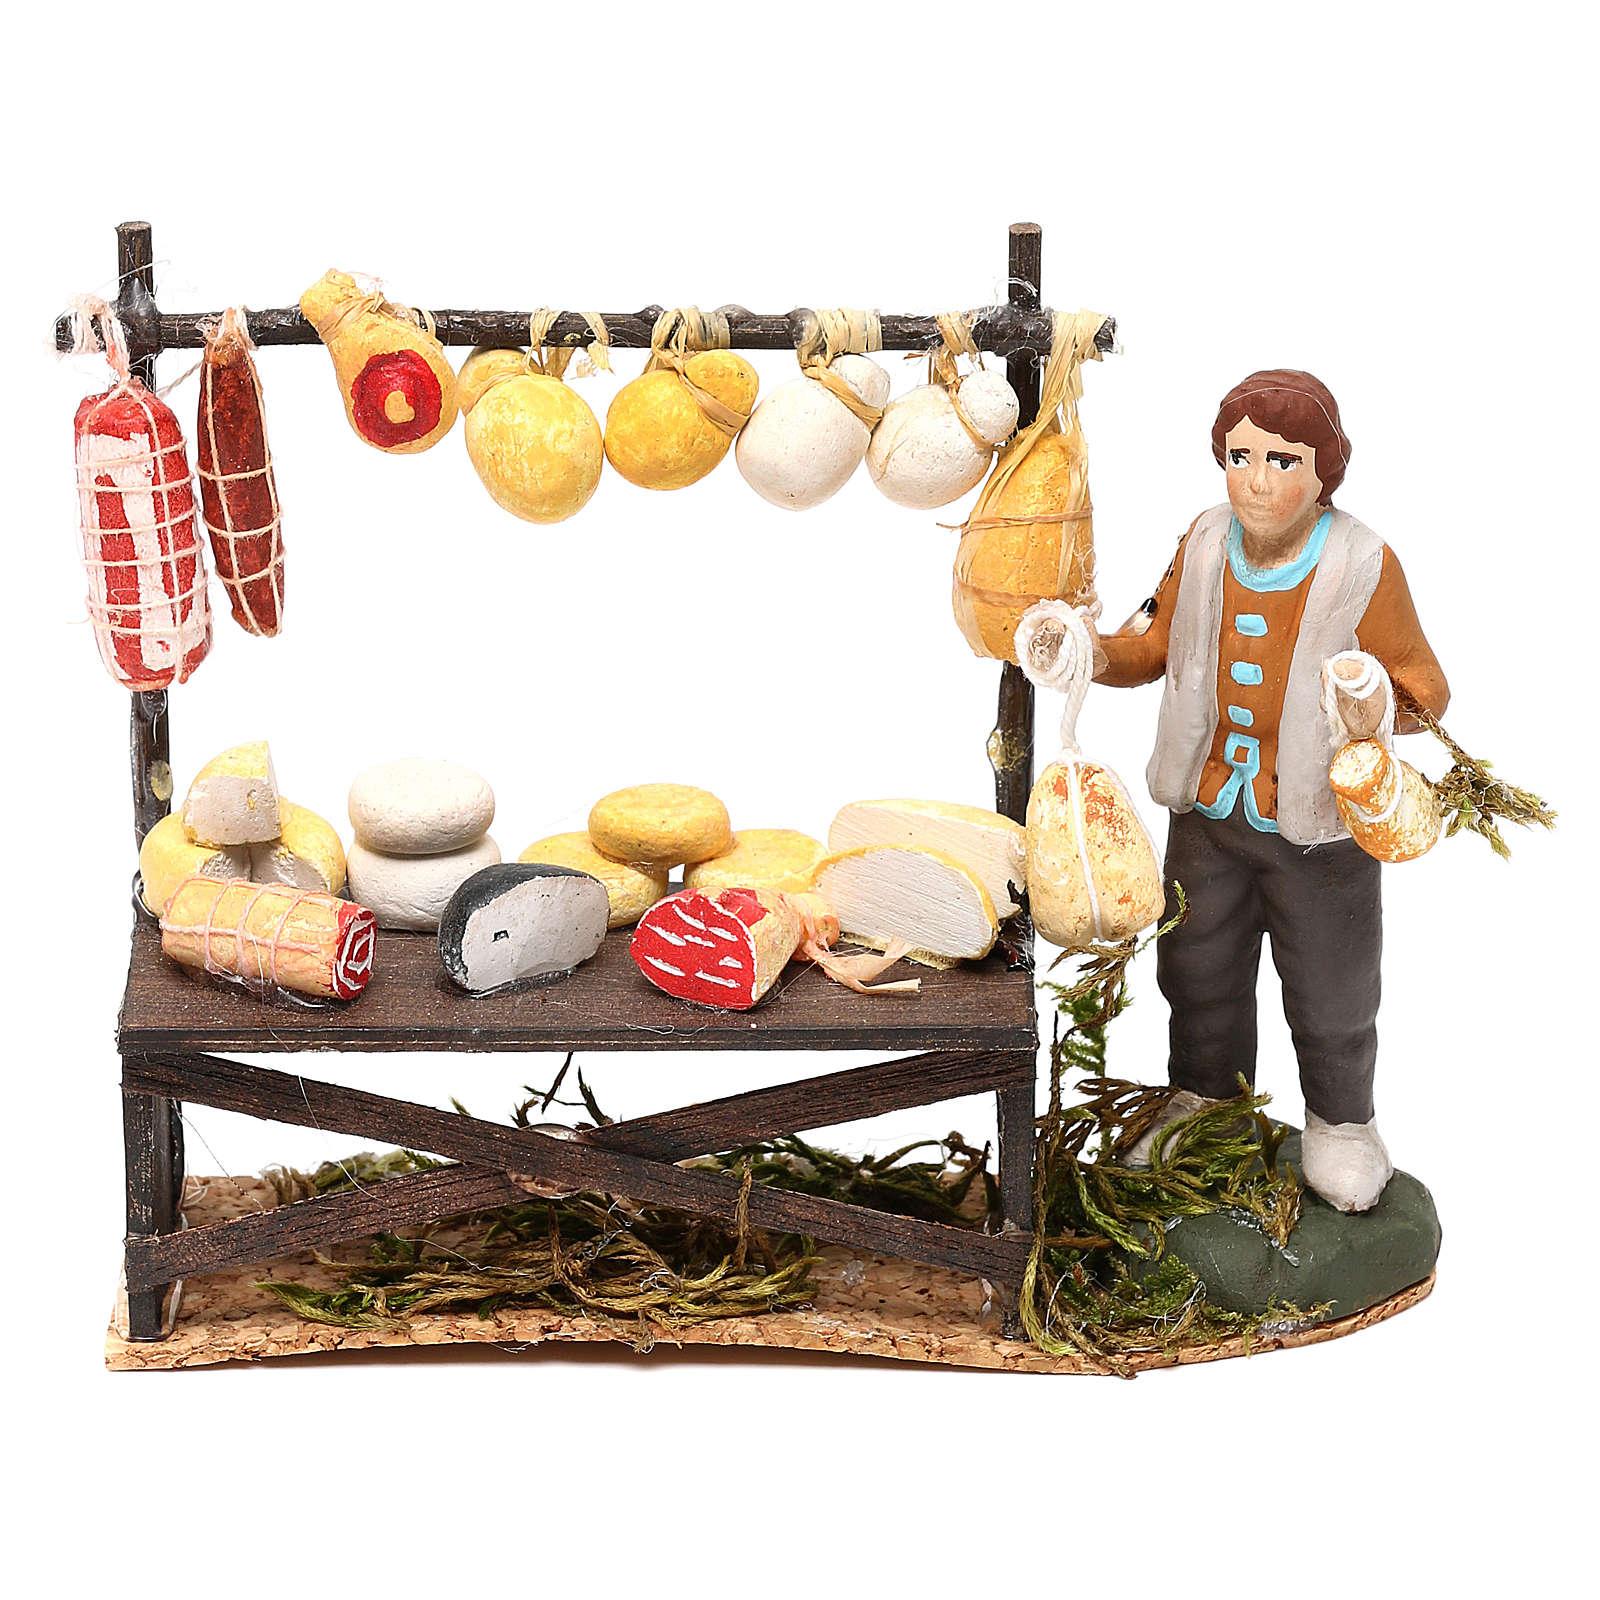 Cheese counter with shepherd for Neapolitan Nativity scene 8 cm 4